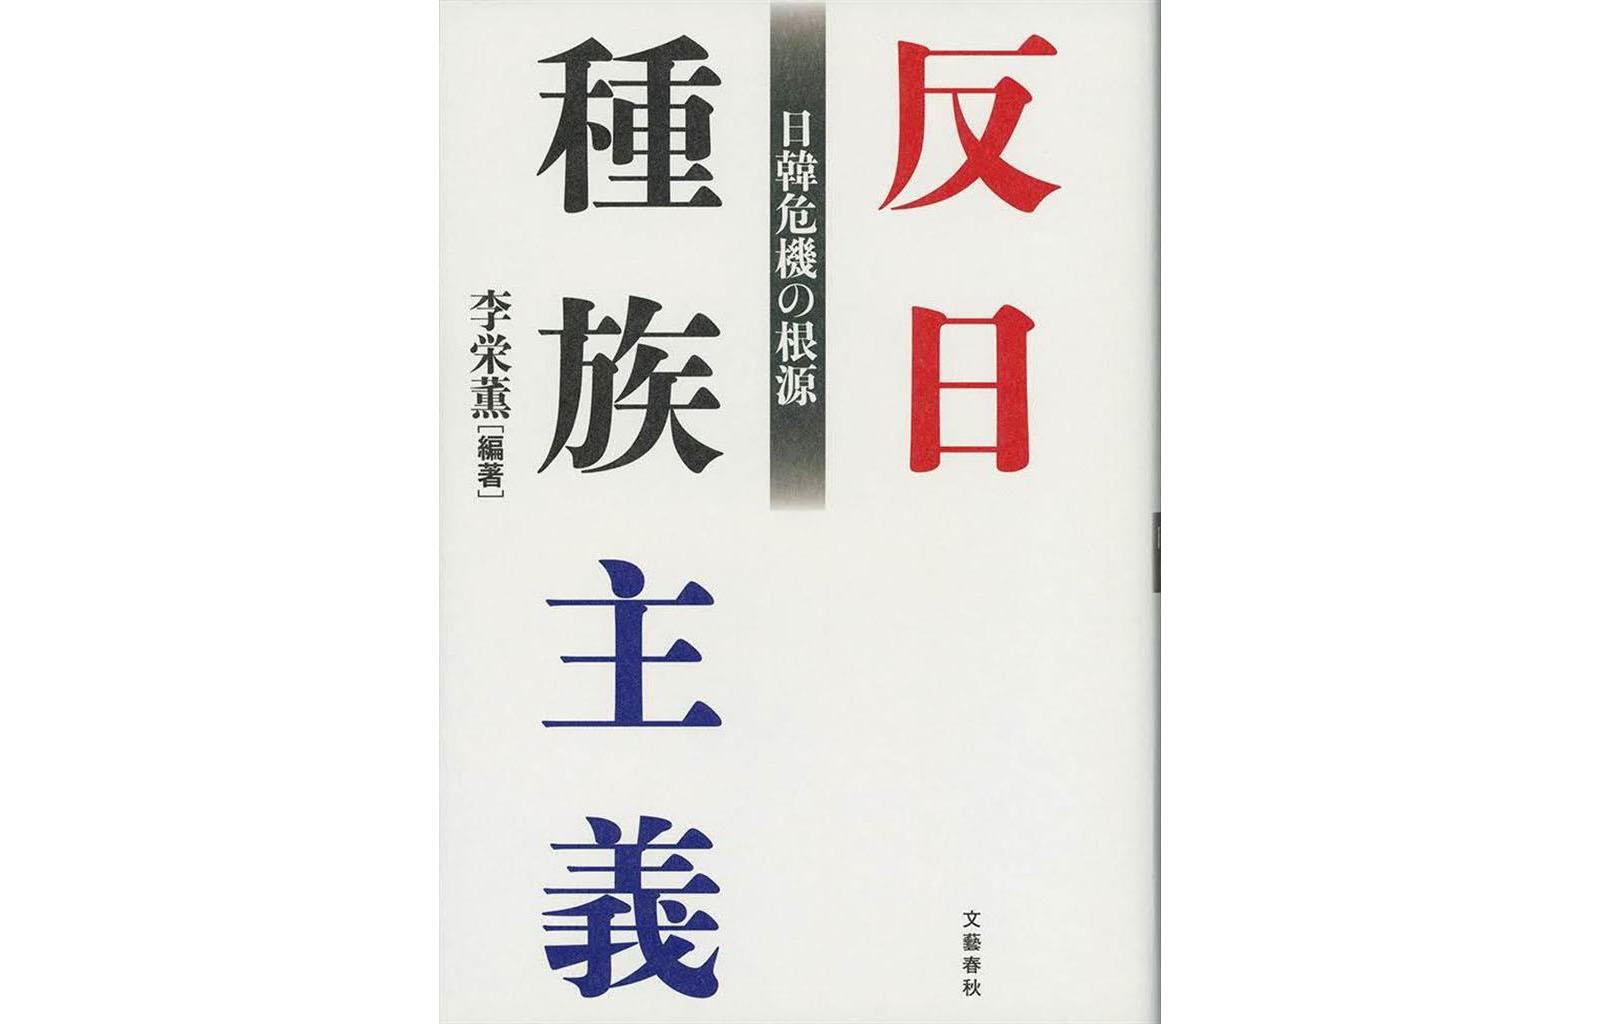 prm1911190007-p1_韓国でベストセラーになった「反日種族主義」の日本語版